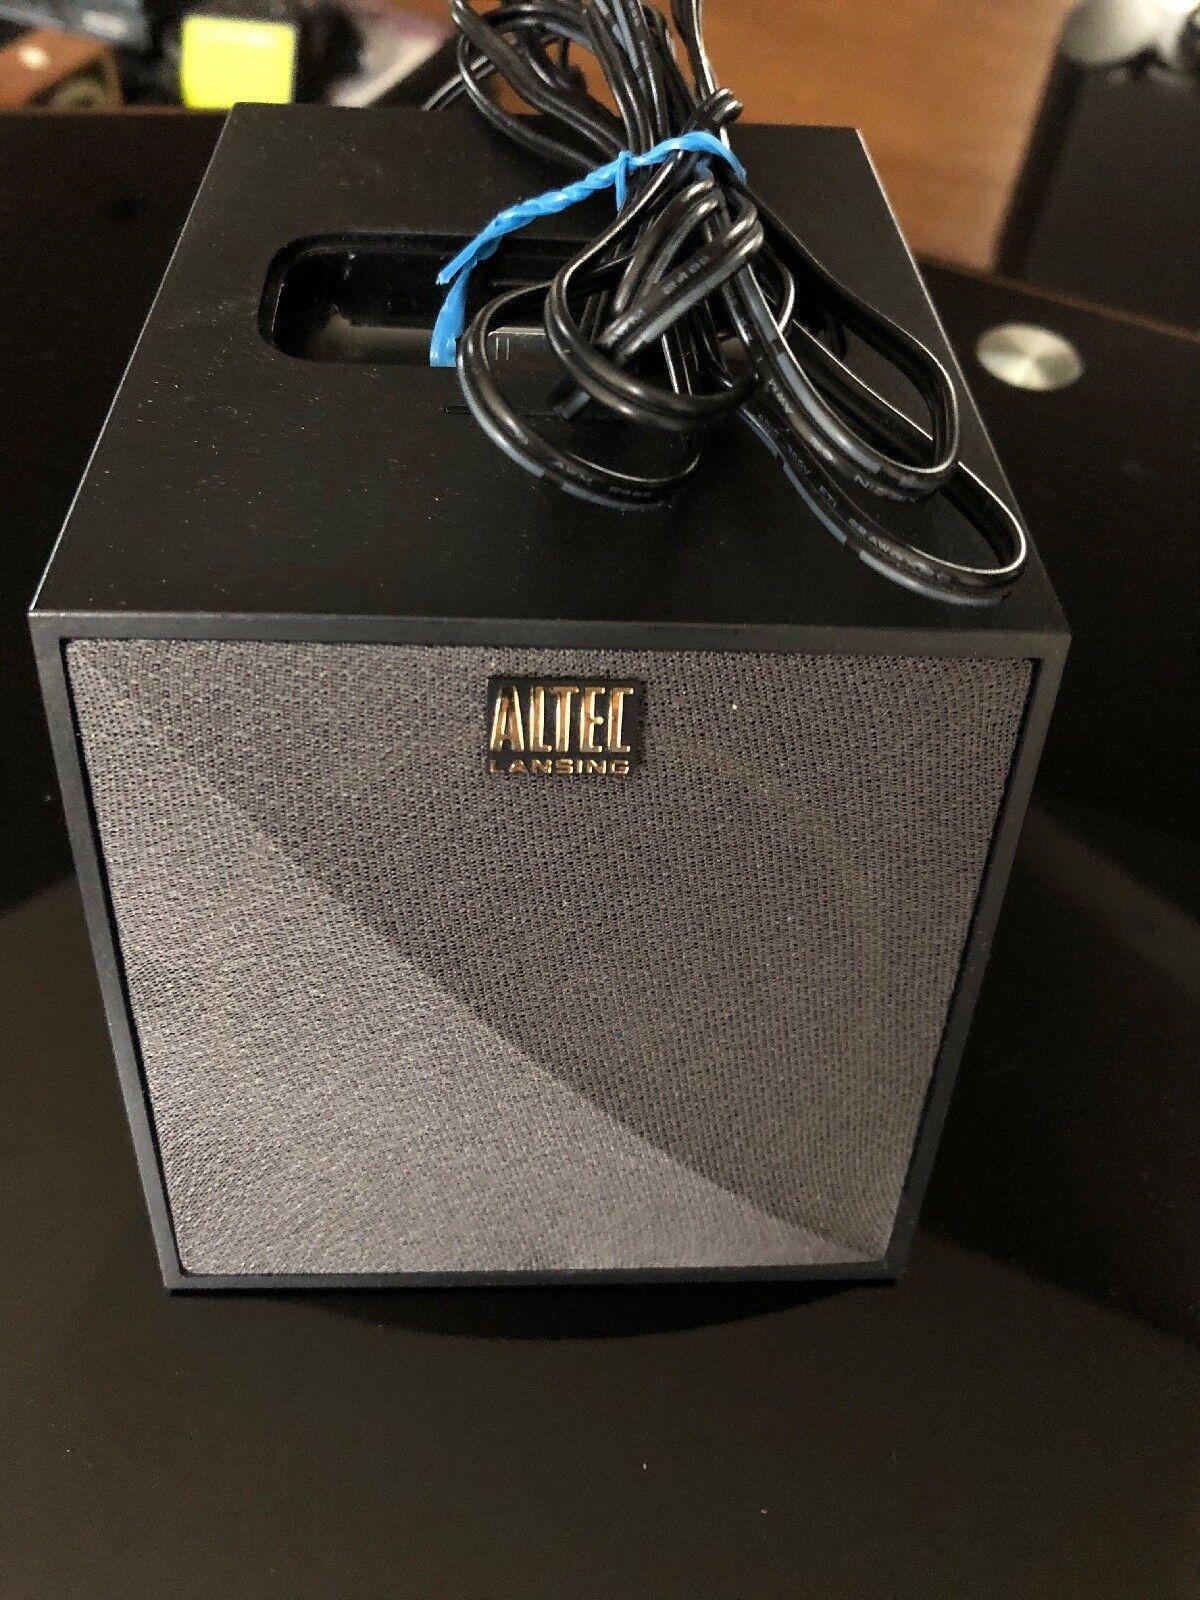 Altec Lansing M102 Octiv Mini iPod & iPhone Docking Station Speaker System